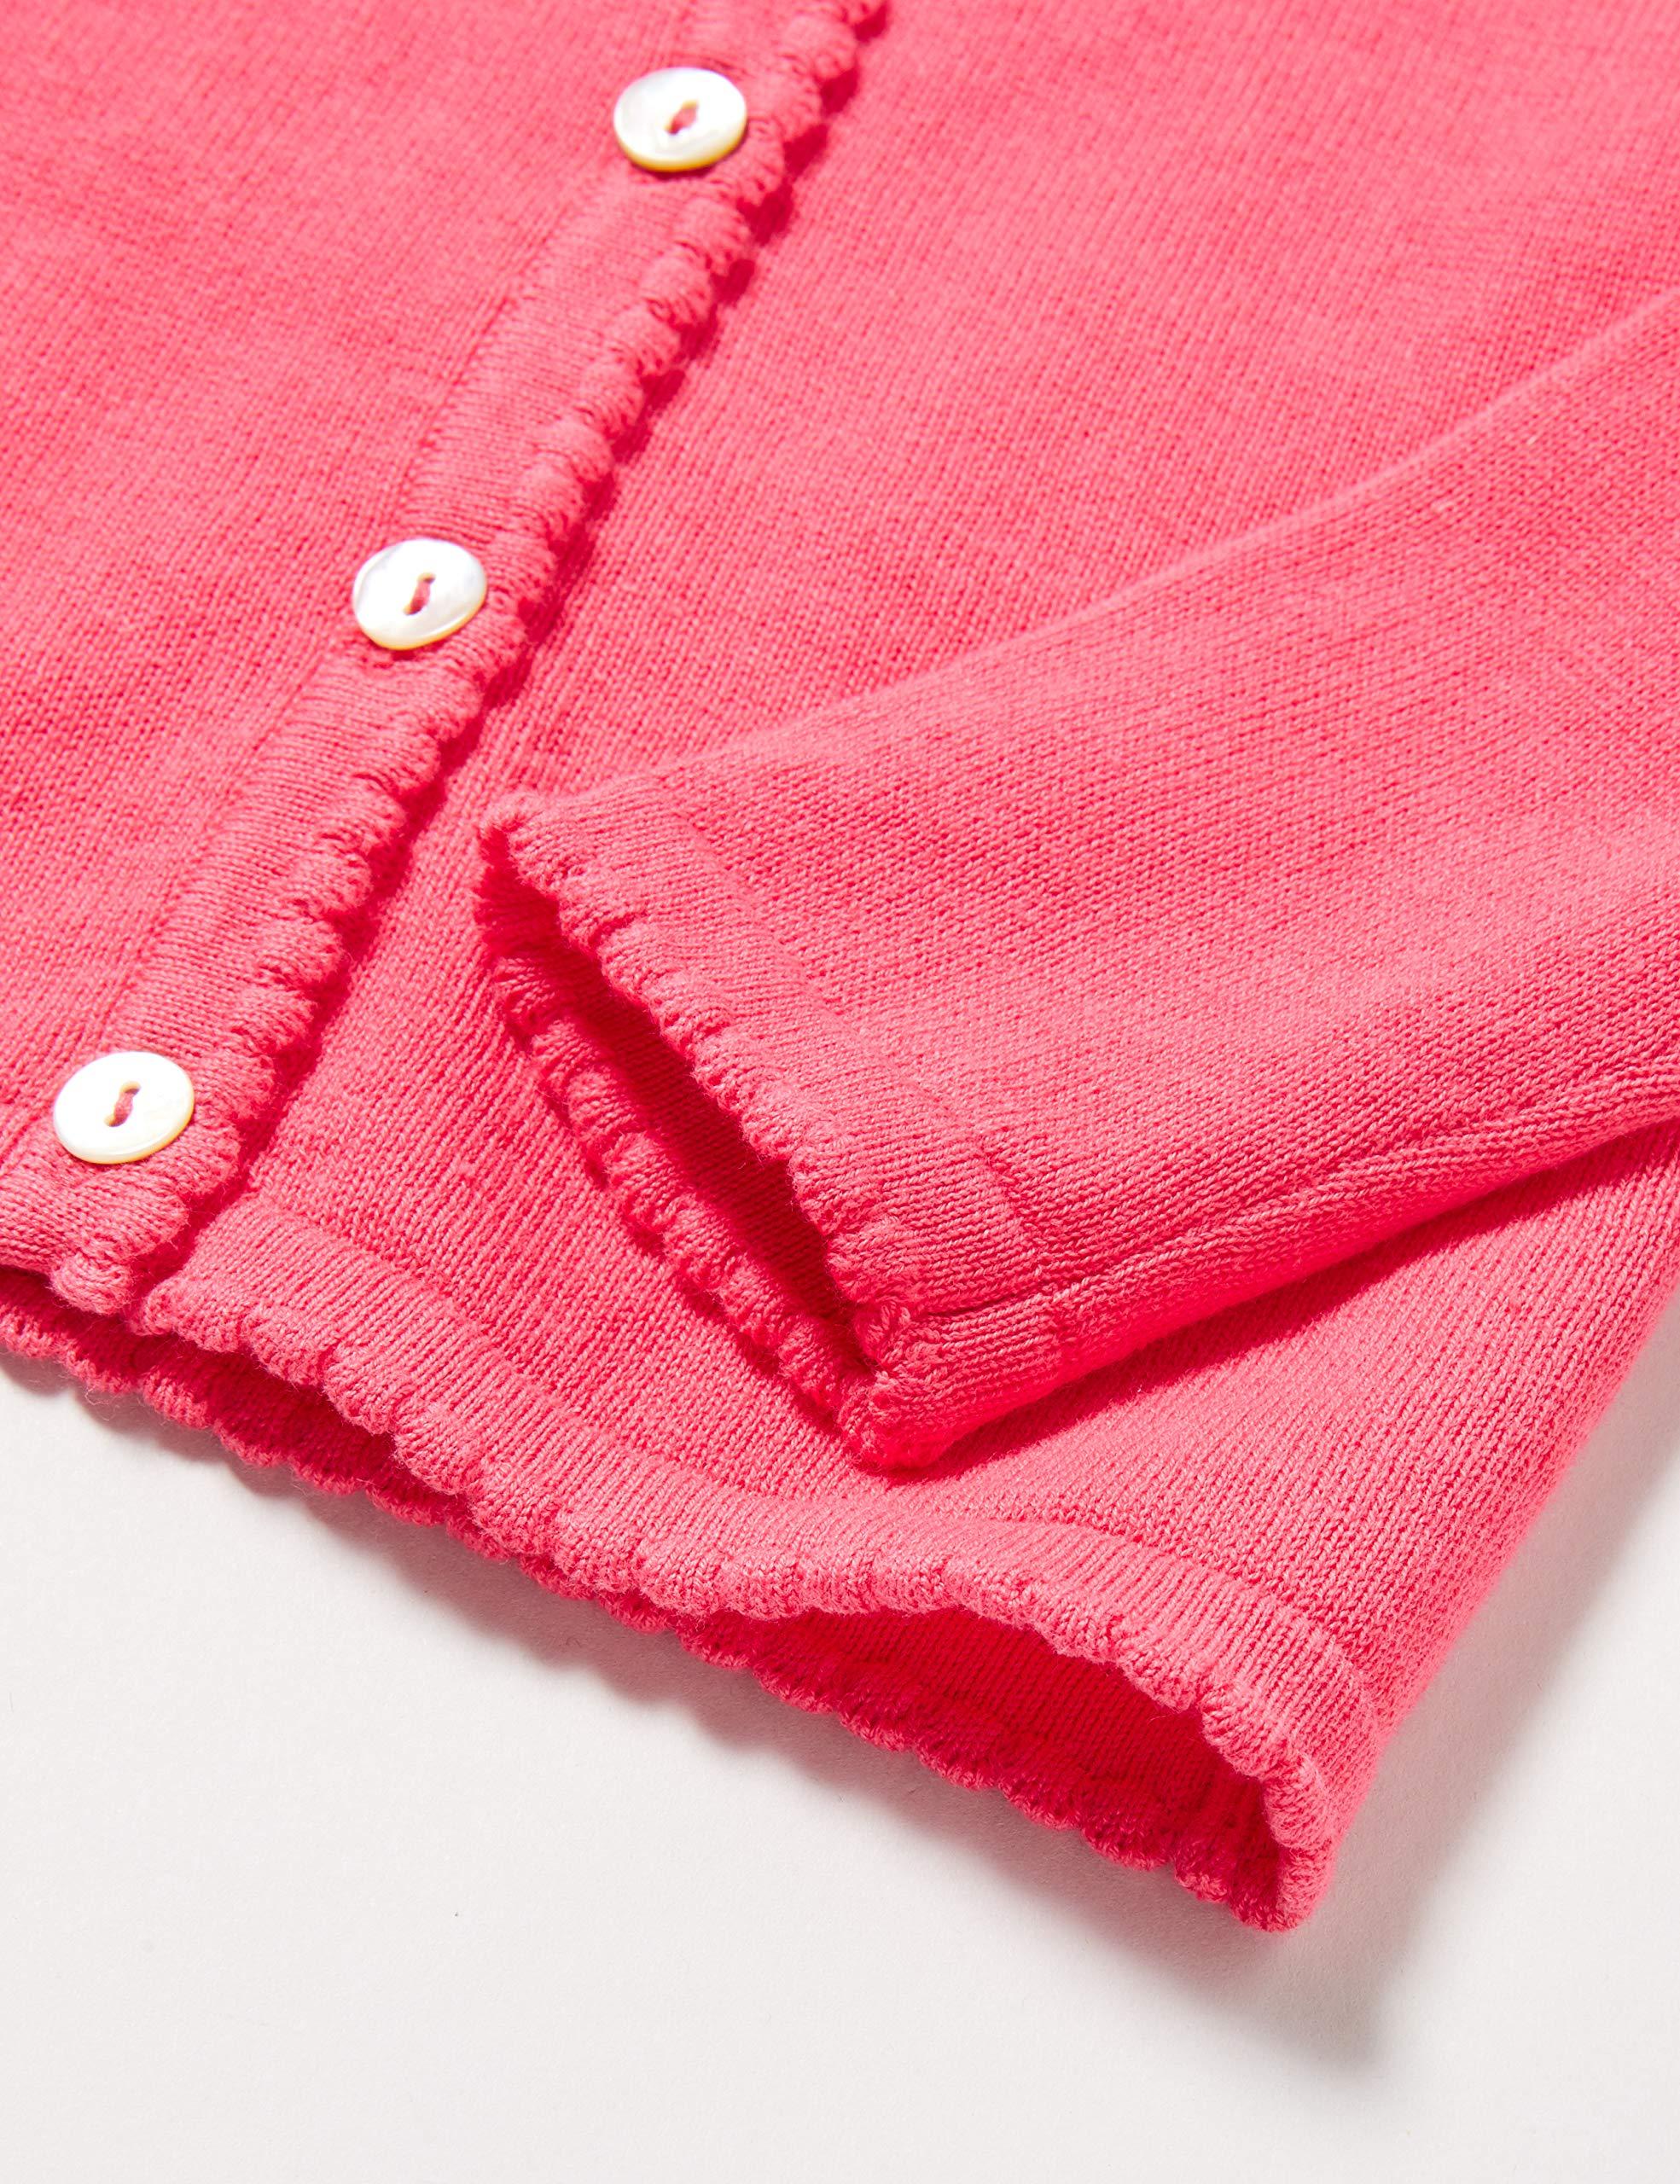 Noa Noa Miniature Baby Basic Light Knit Chaqueta Punto para Bebés 4